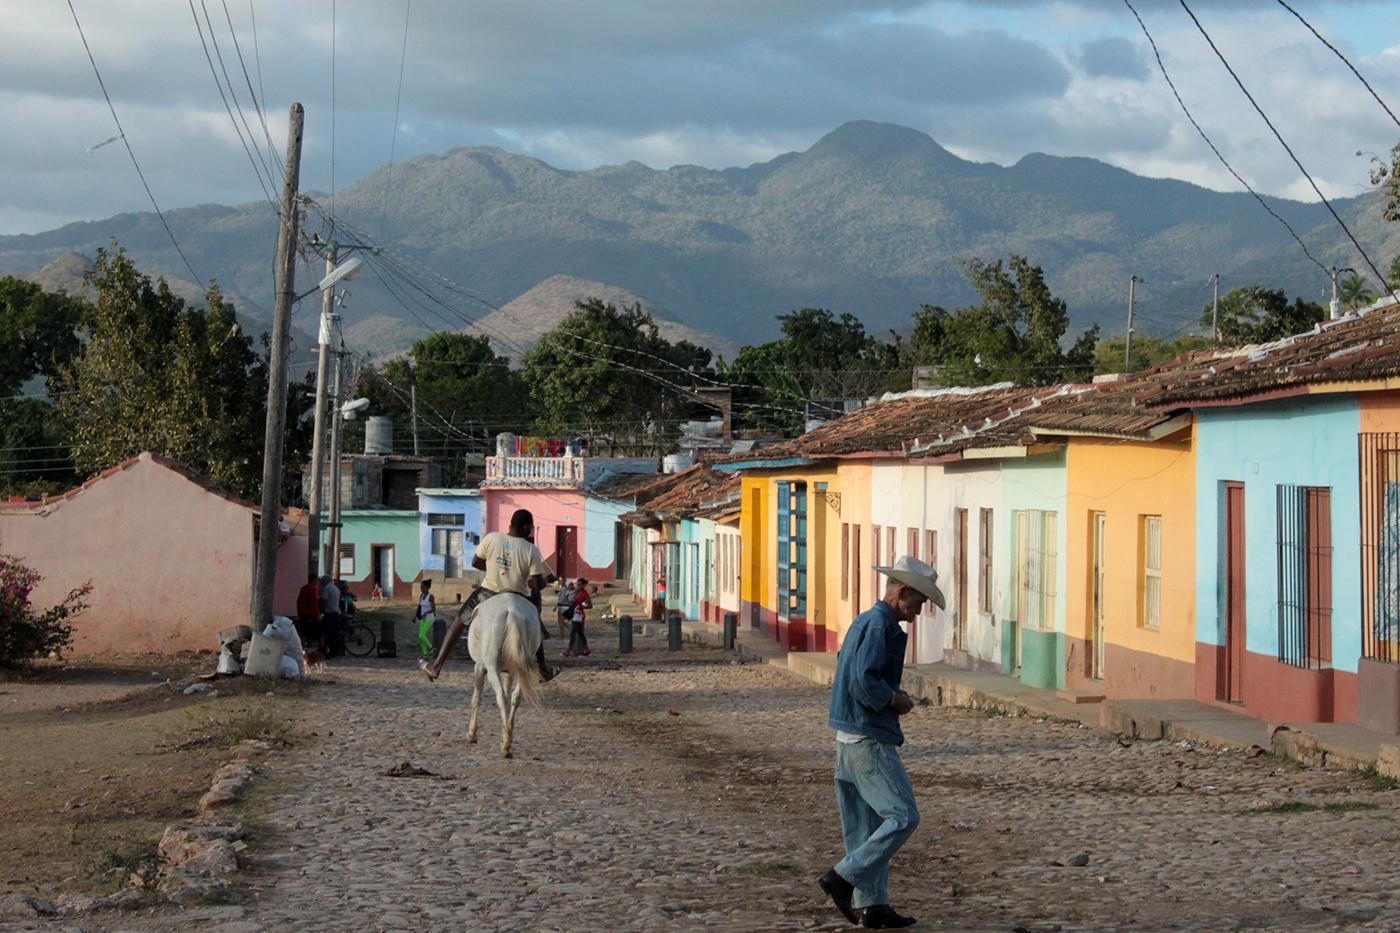 Trinidad Cuba Travel Blog Reisiblogi Teiselpoolmaakera